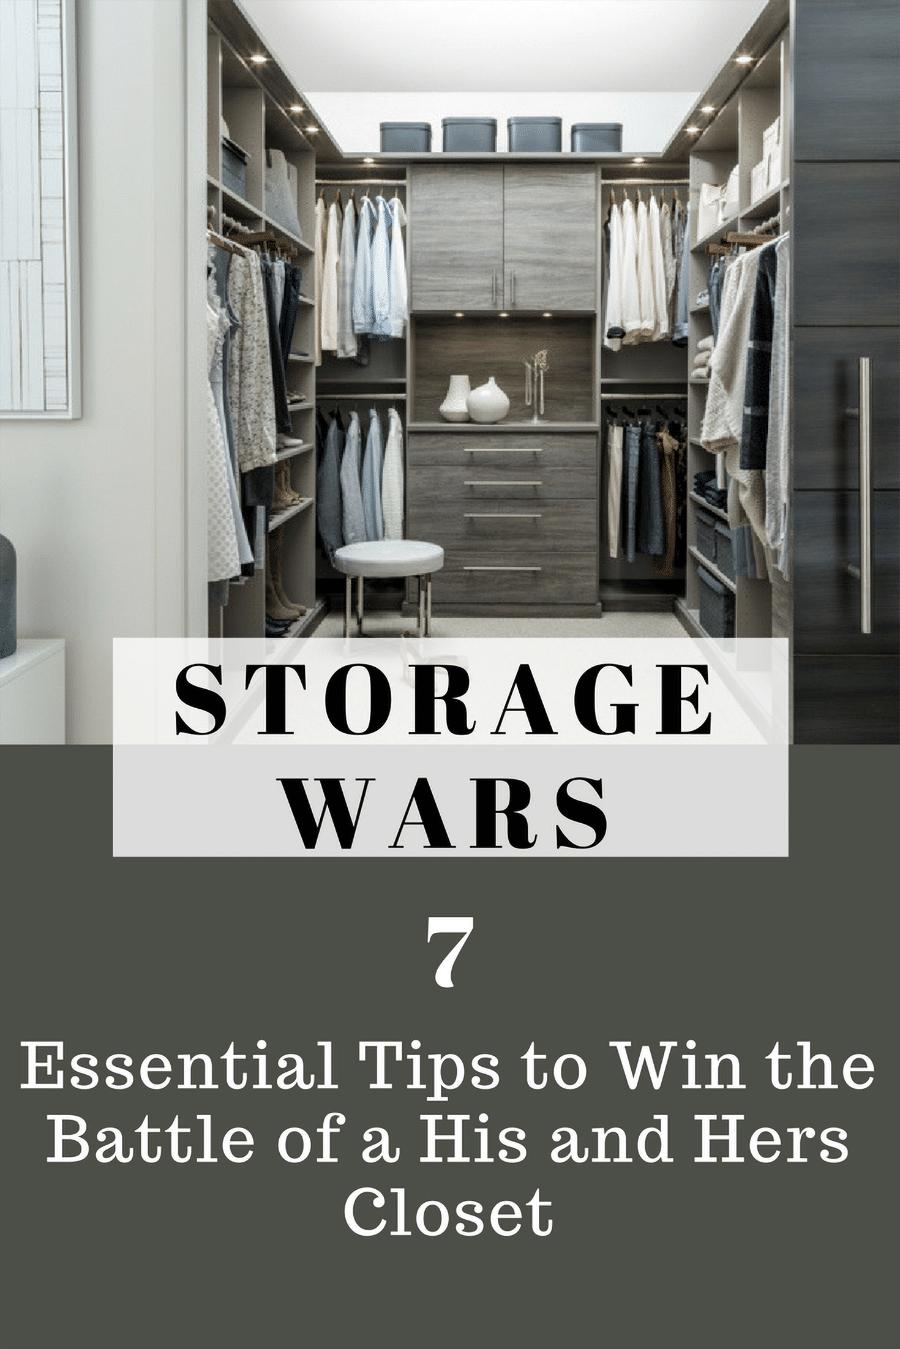 Step 9 His and hers closet design strategies Columbus Ohio | Innovate Home Org | #Storage #OrganizationStorage #StorageWars